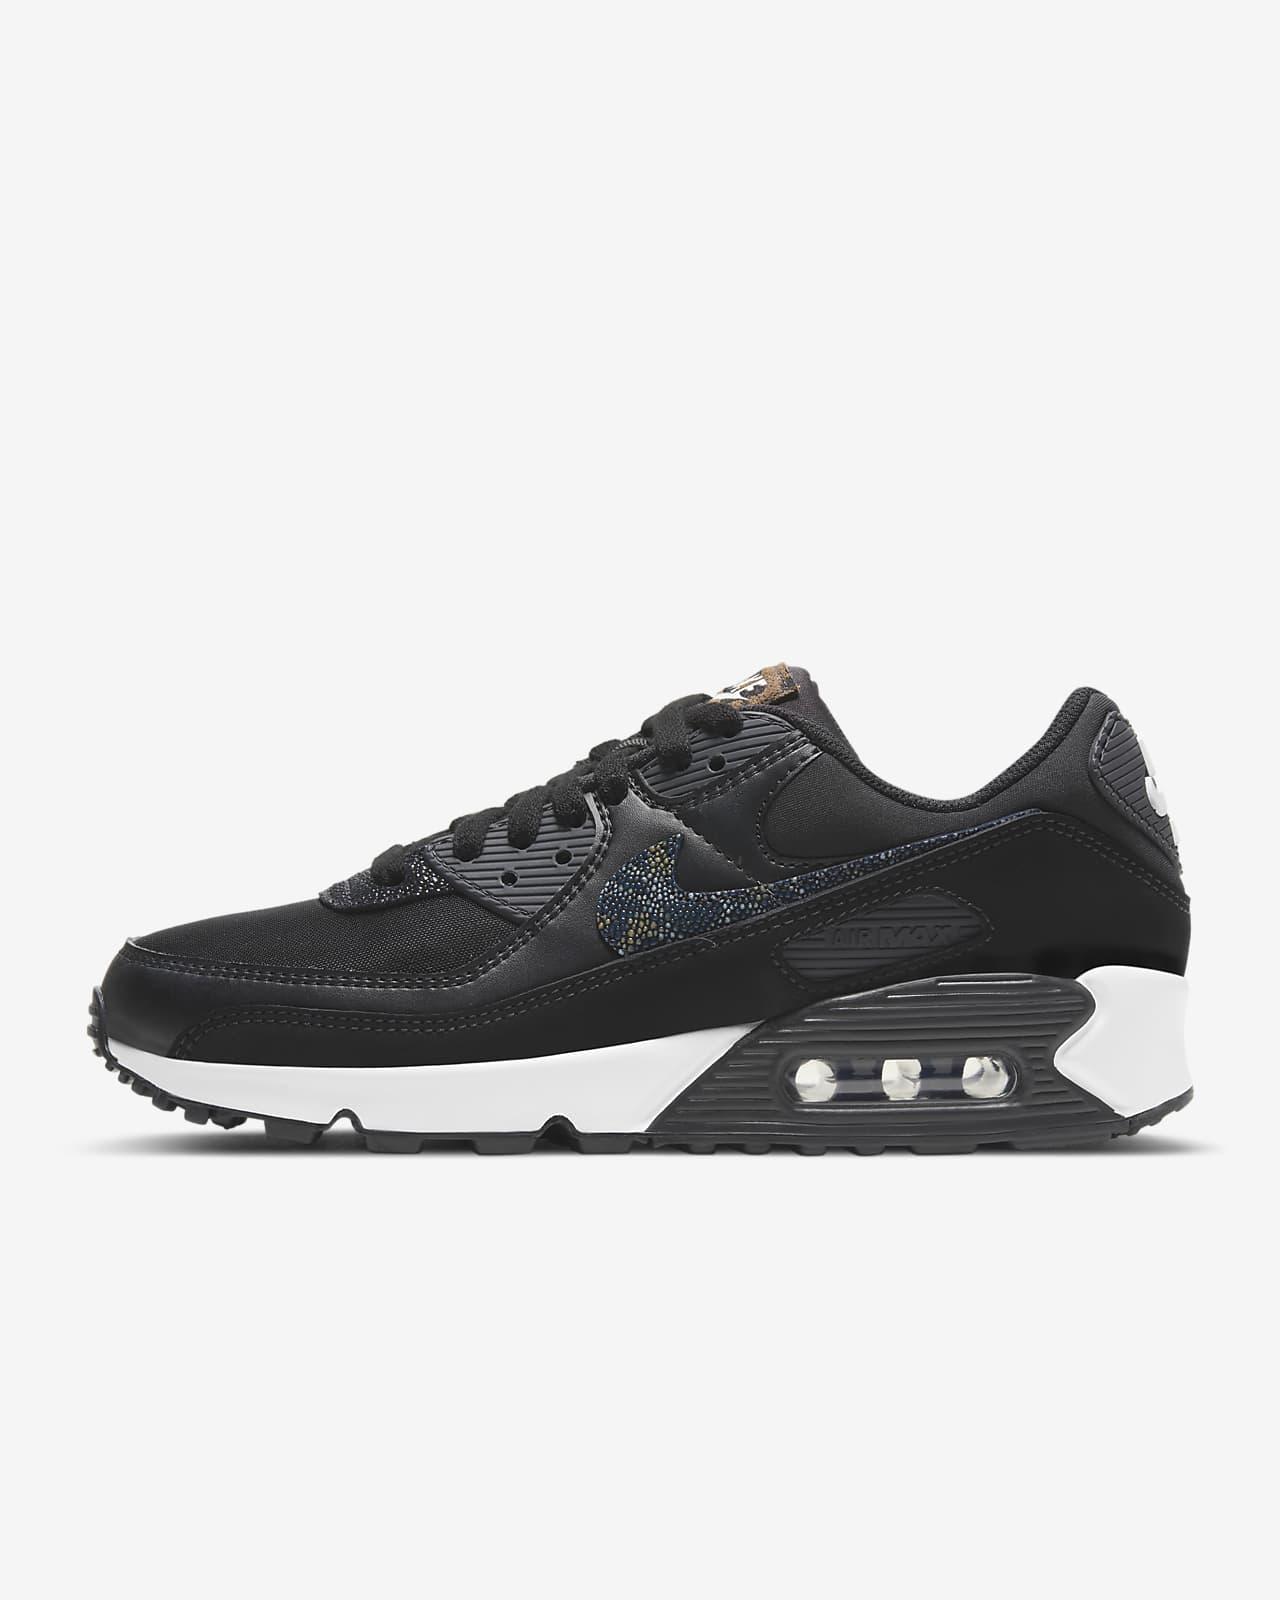 Chaussure Nike Air Max 90 SE pour Femme